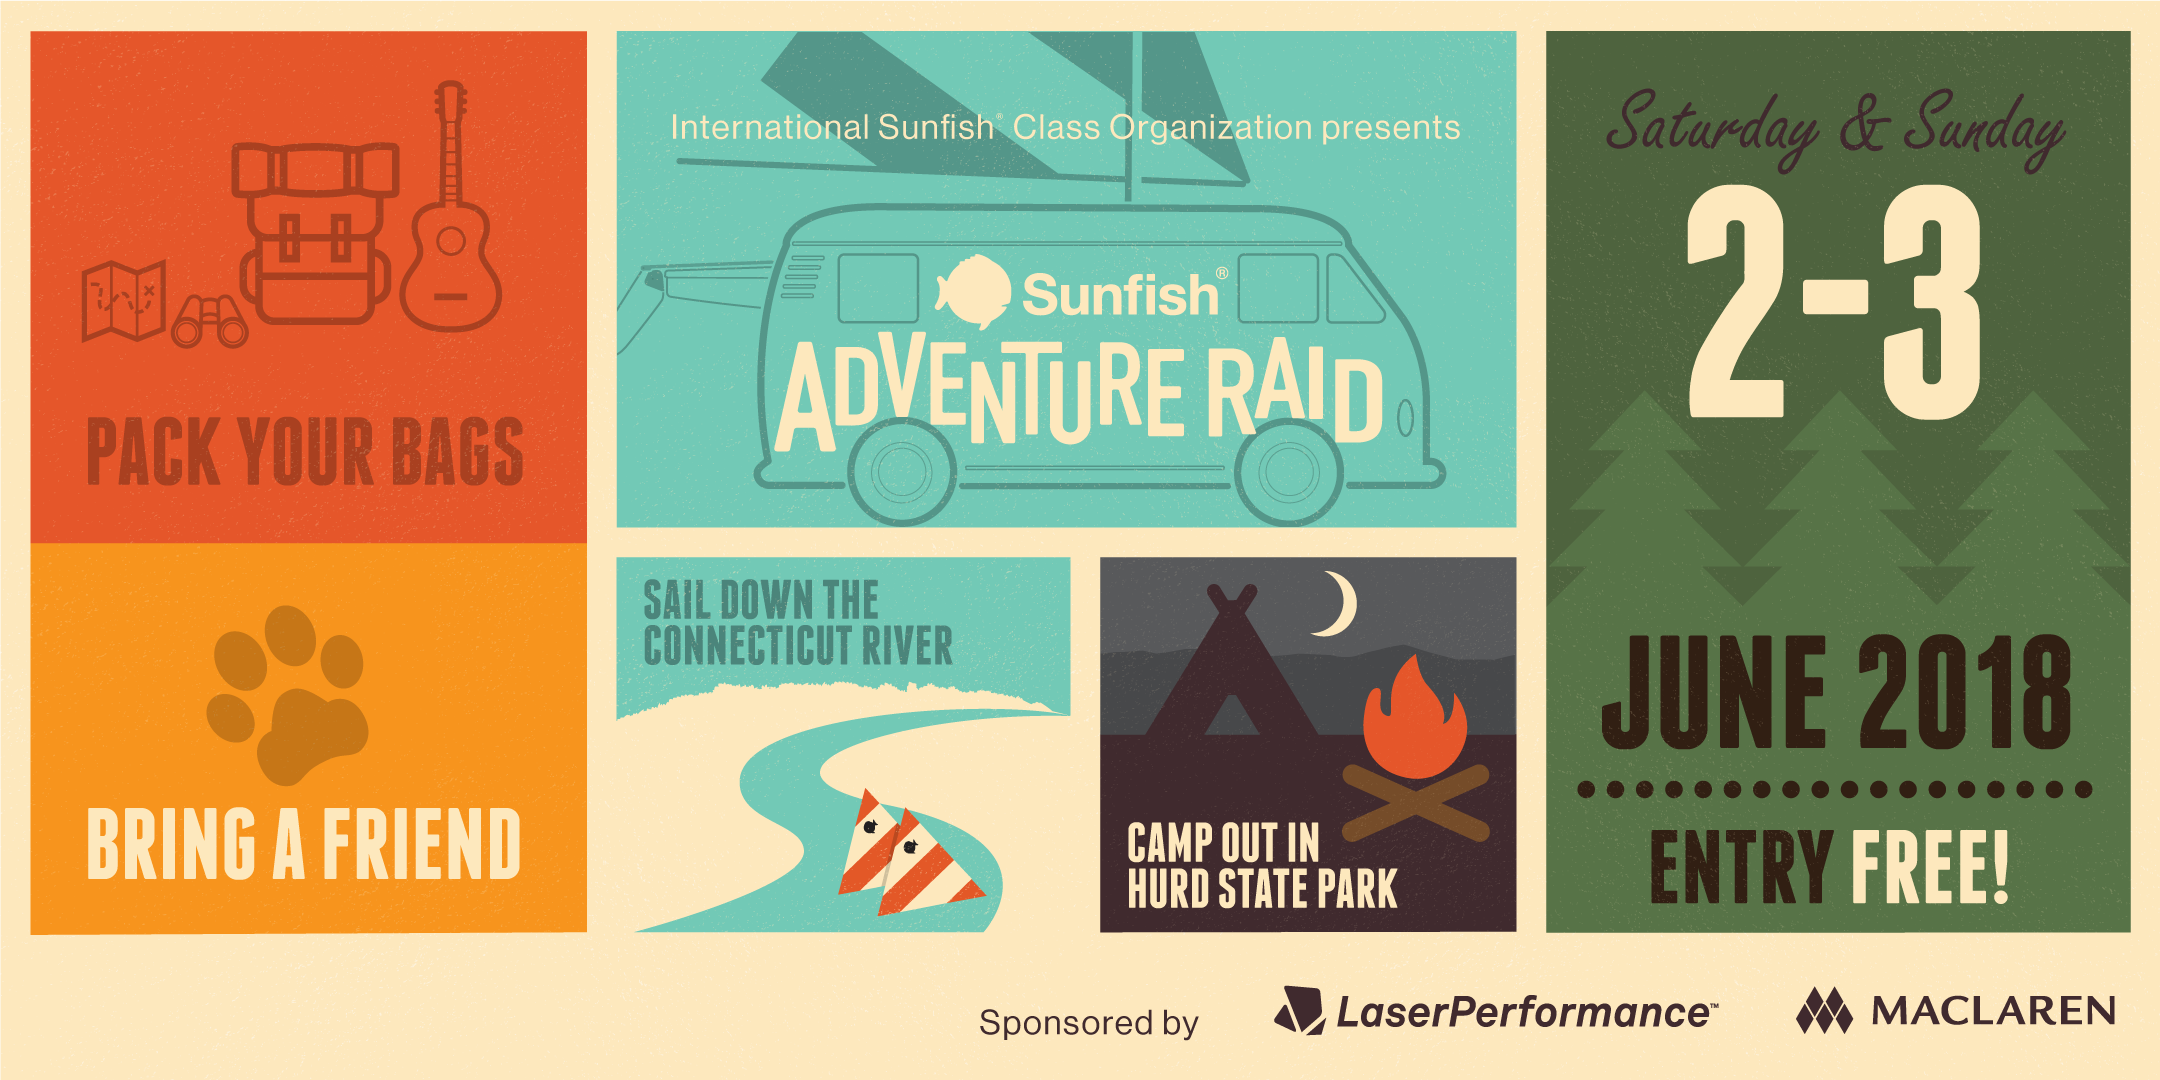 Sunfish Adventure Raid Draft 2.png